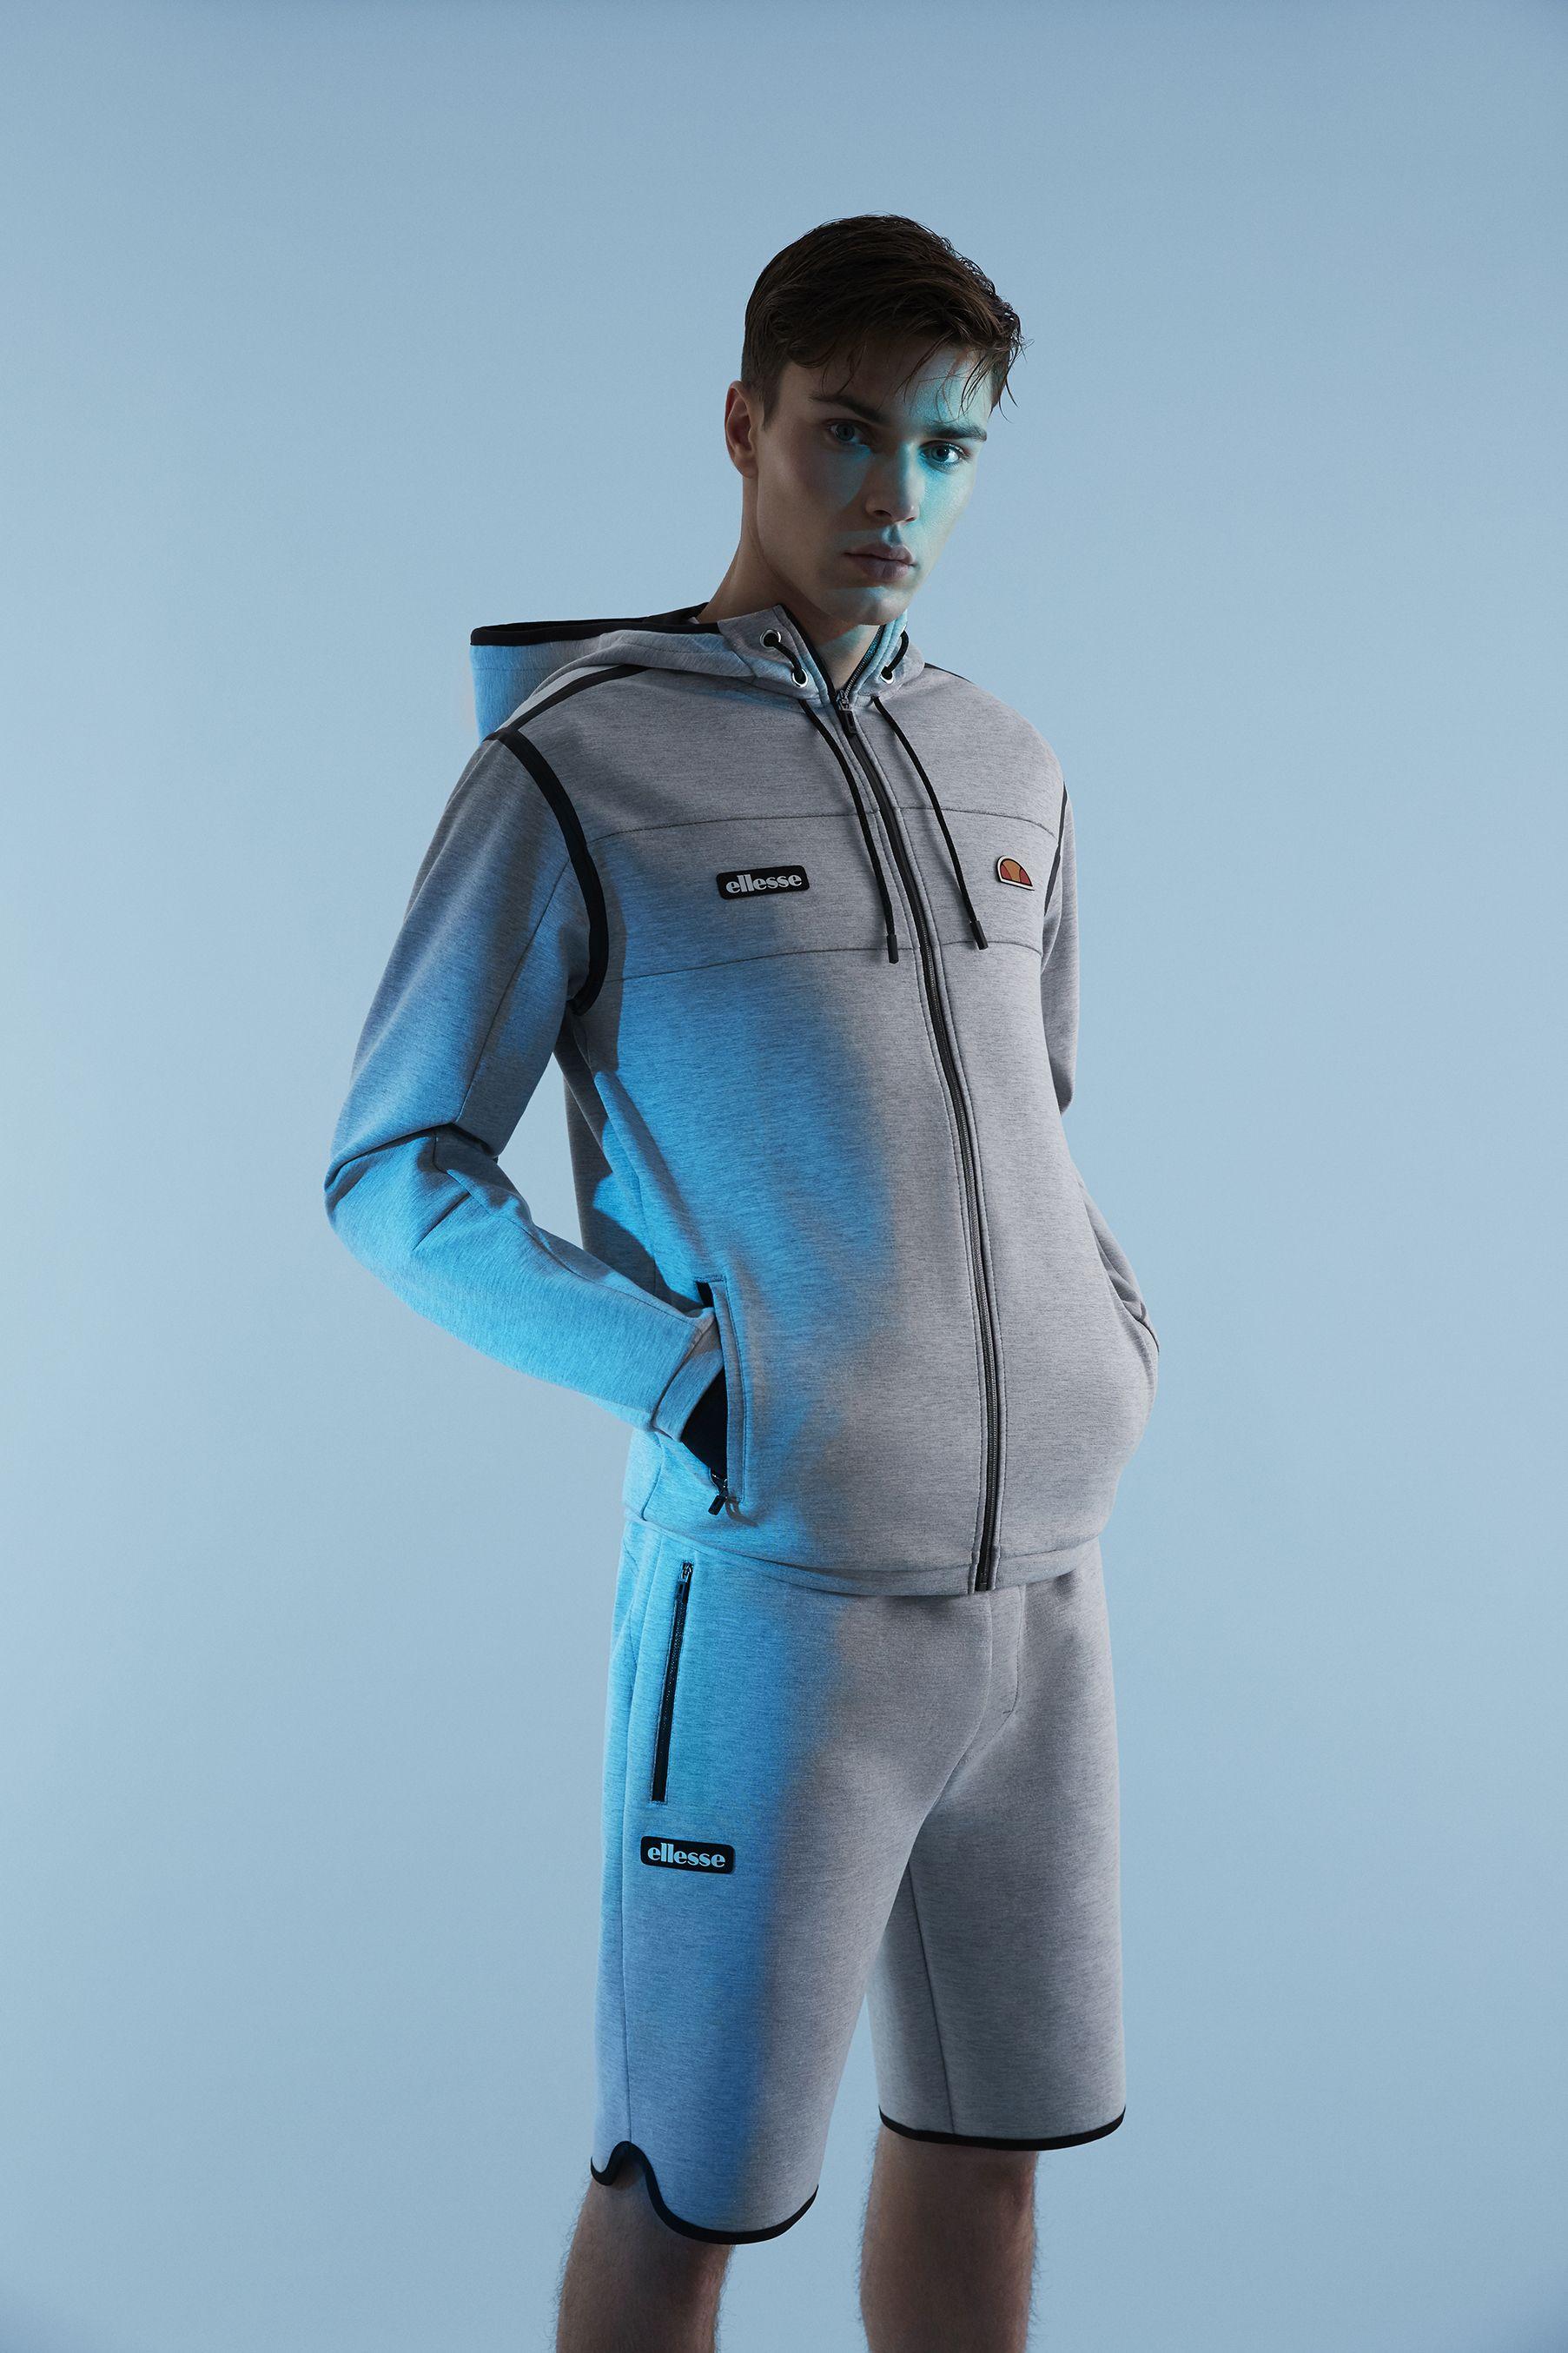 c72e9946e8 ellesse, ellesse clothing, trend, fashion, style, hoodie, hood ...